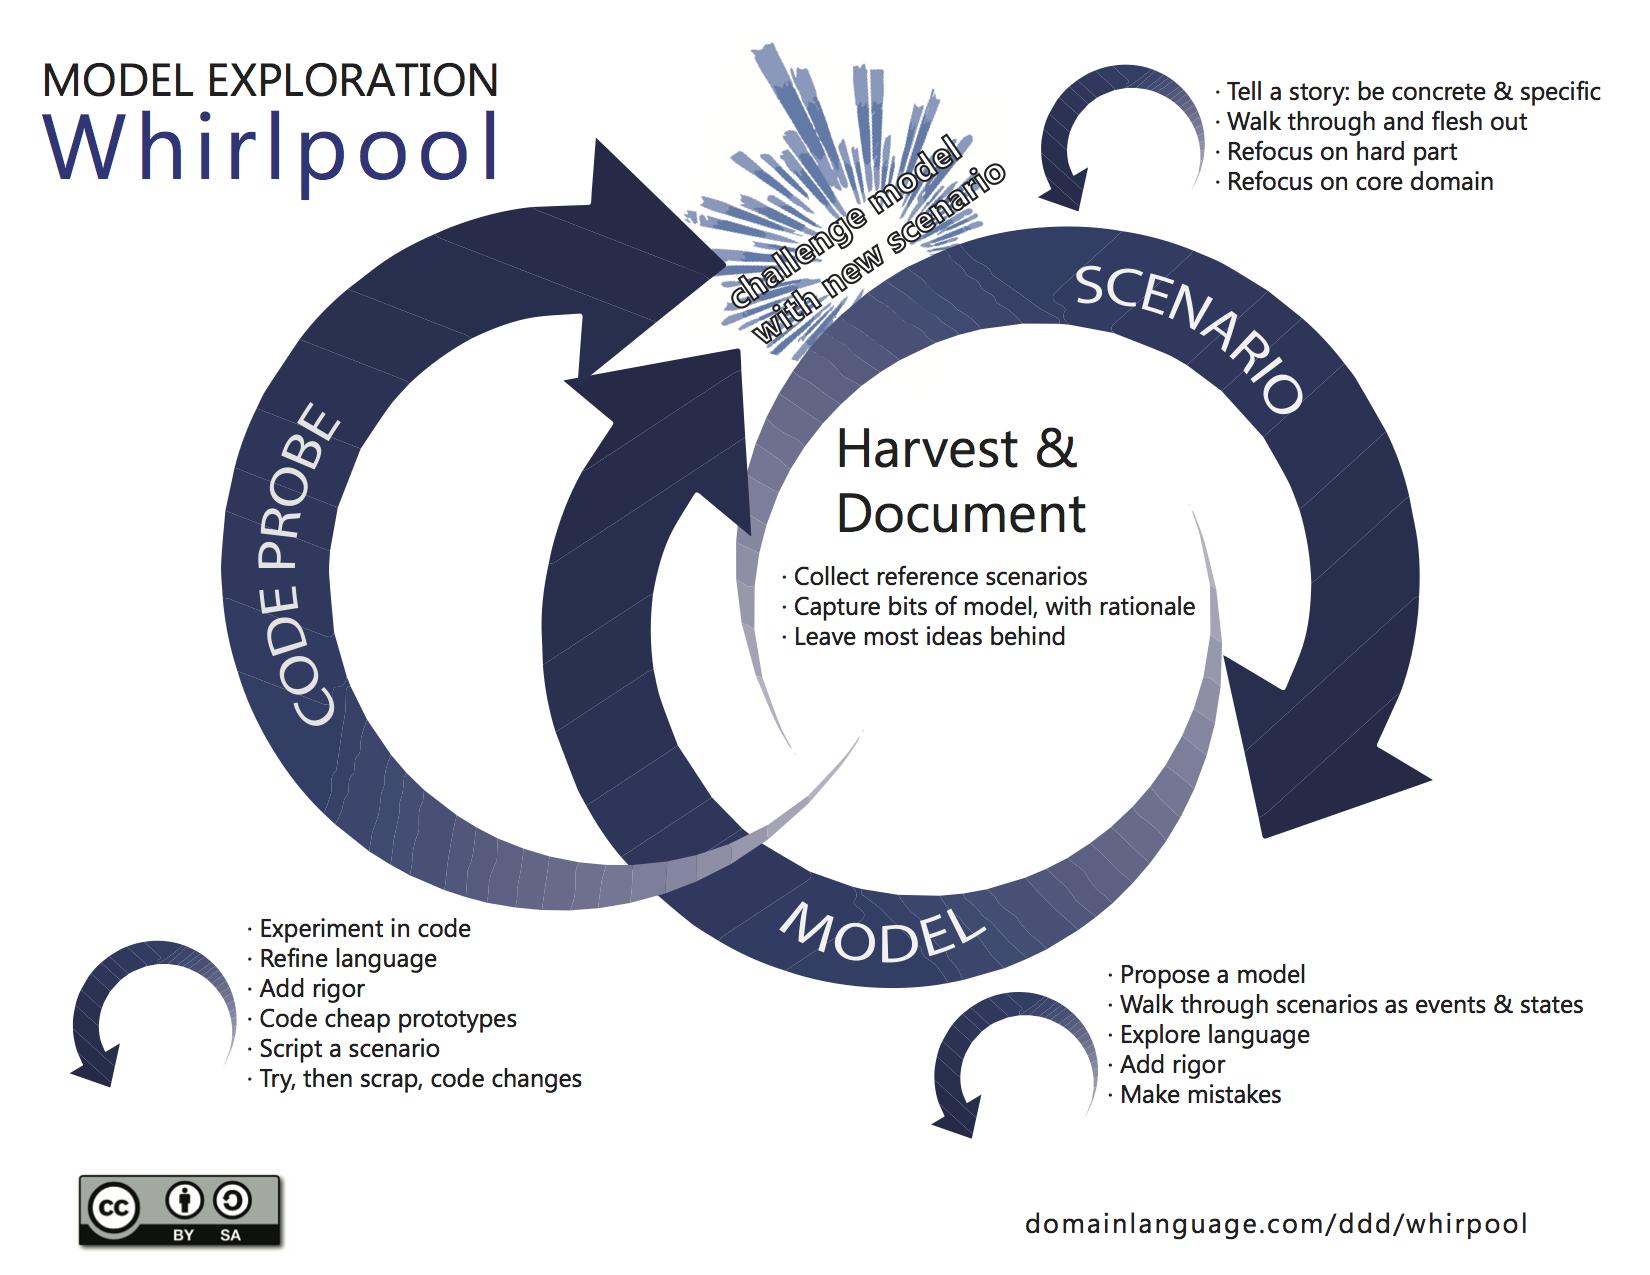 DDD_Model_Exploration_Whirlpool